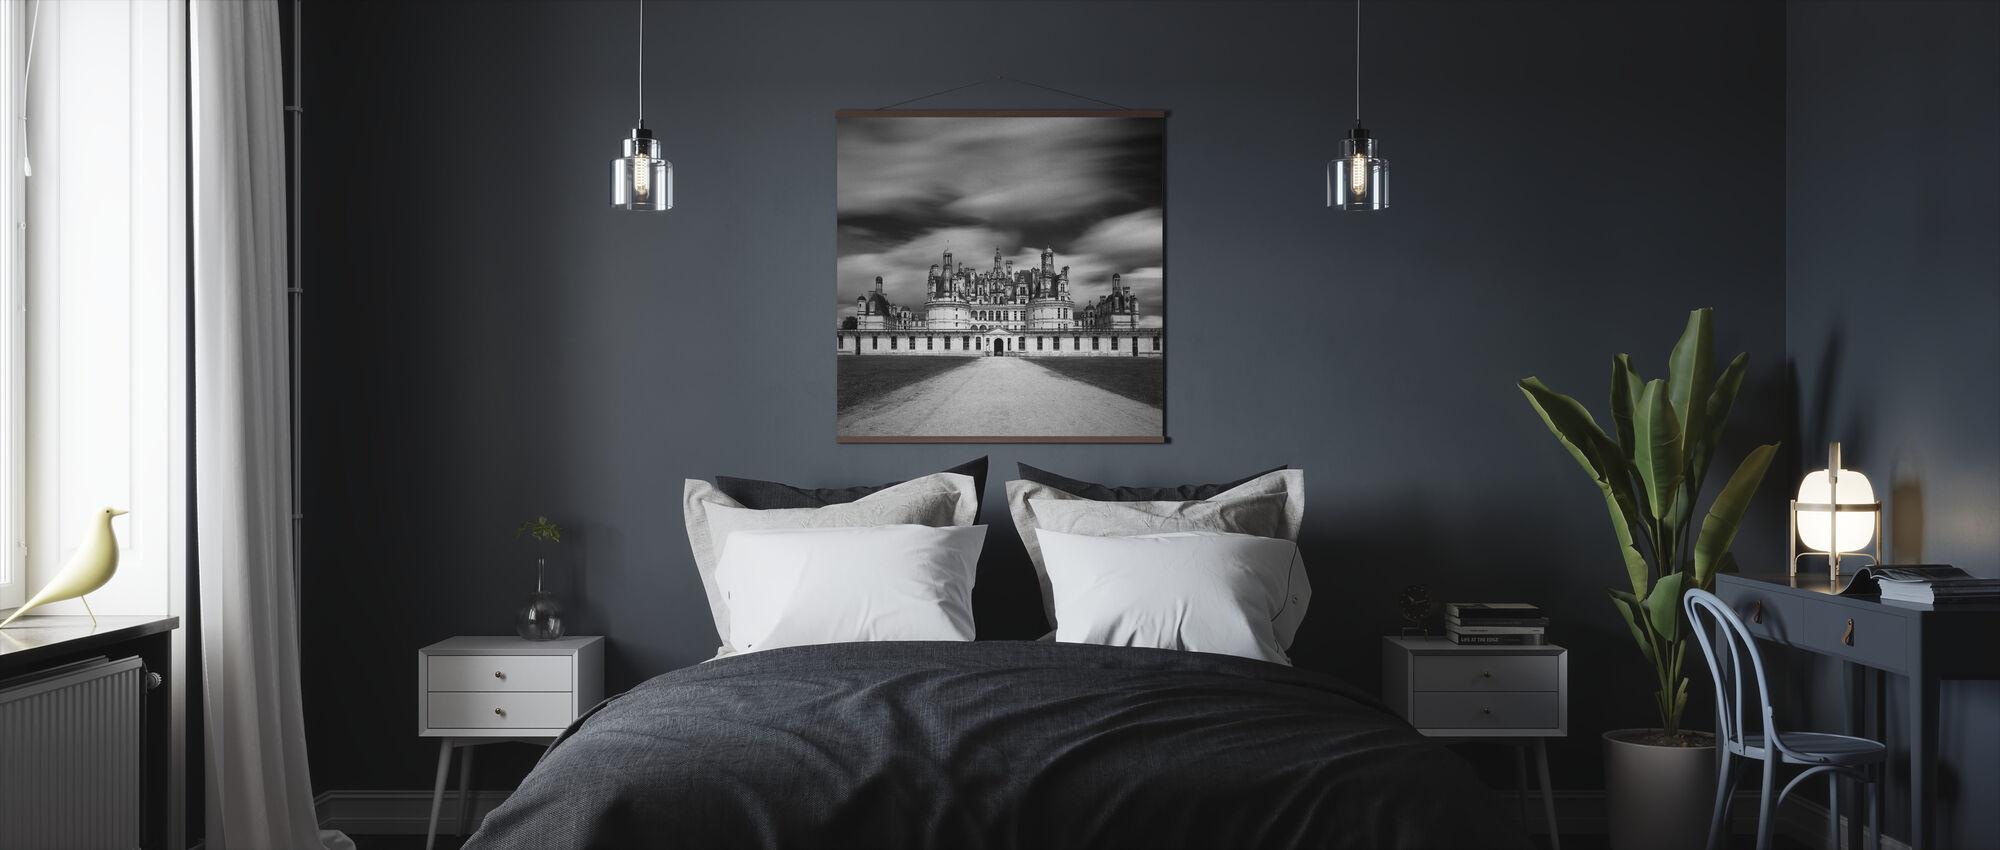 Chambord - Poster - Bedroom